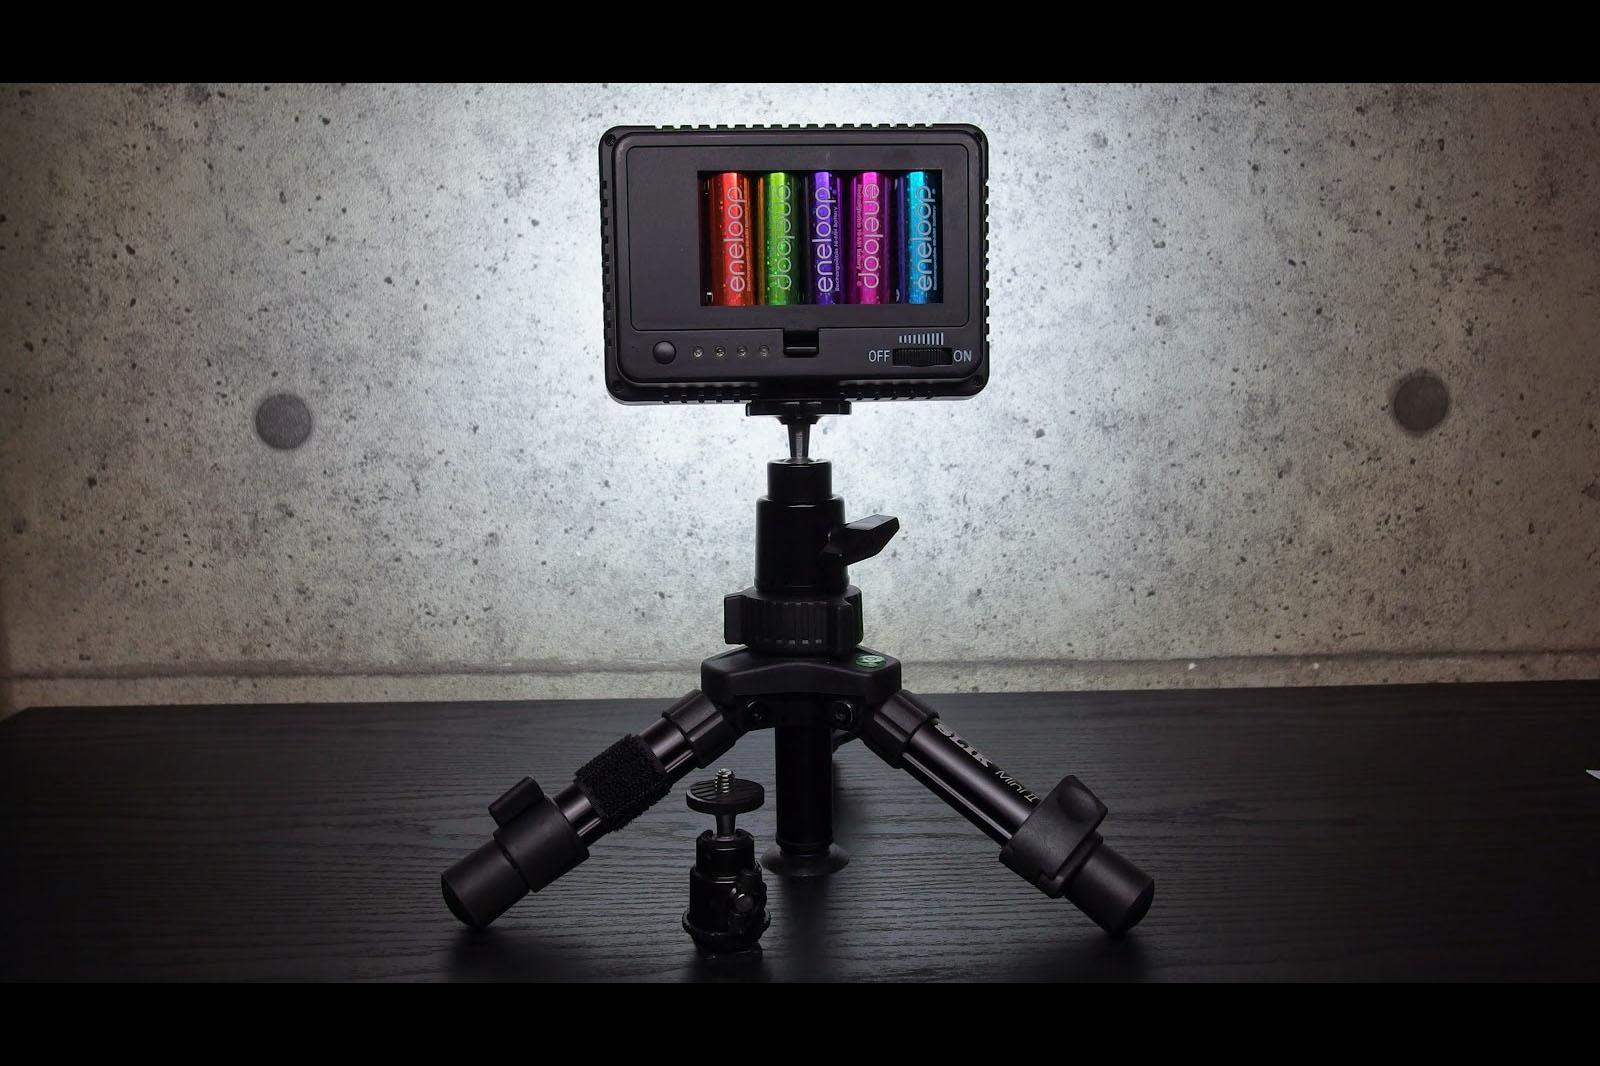 「NEEWER ハイパワー 160 LED ビデオライト」